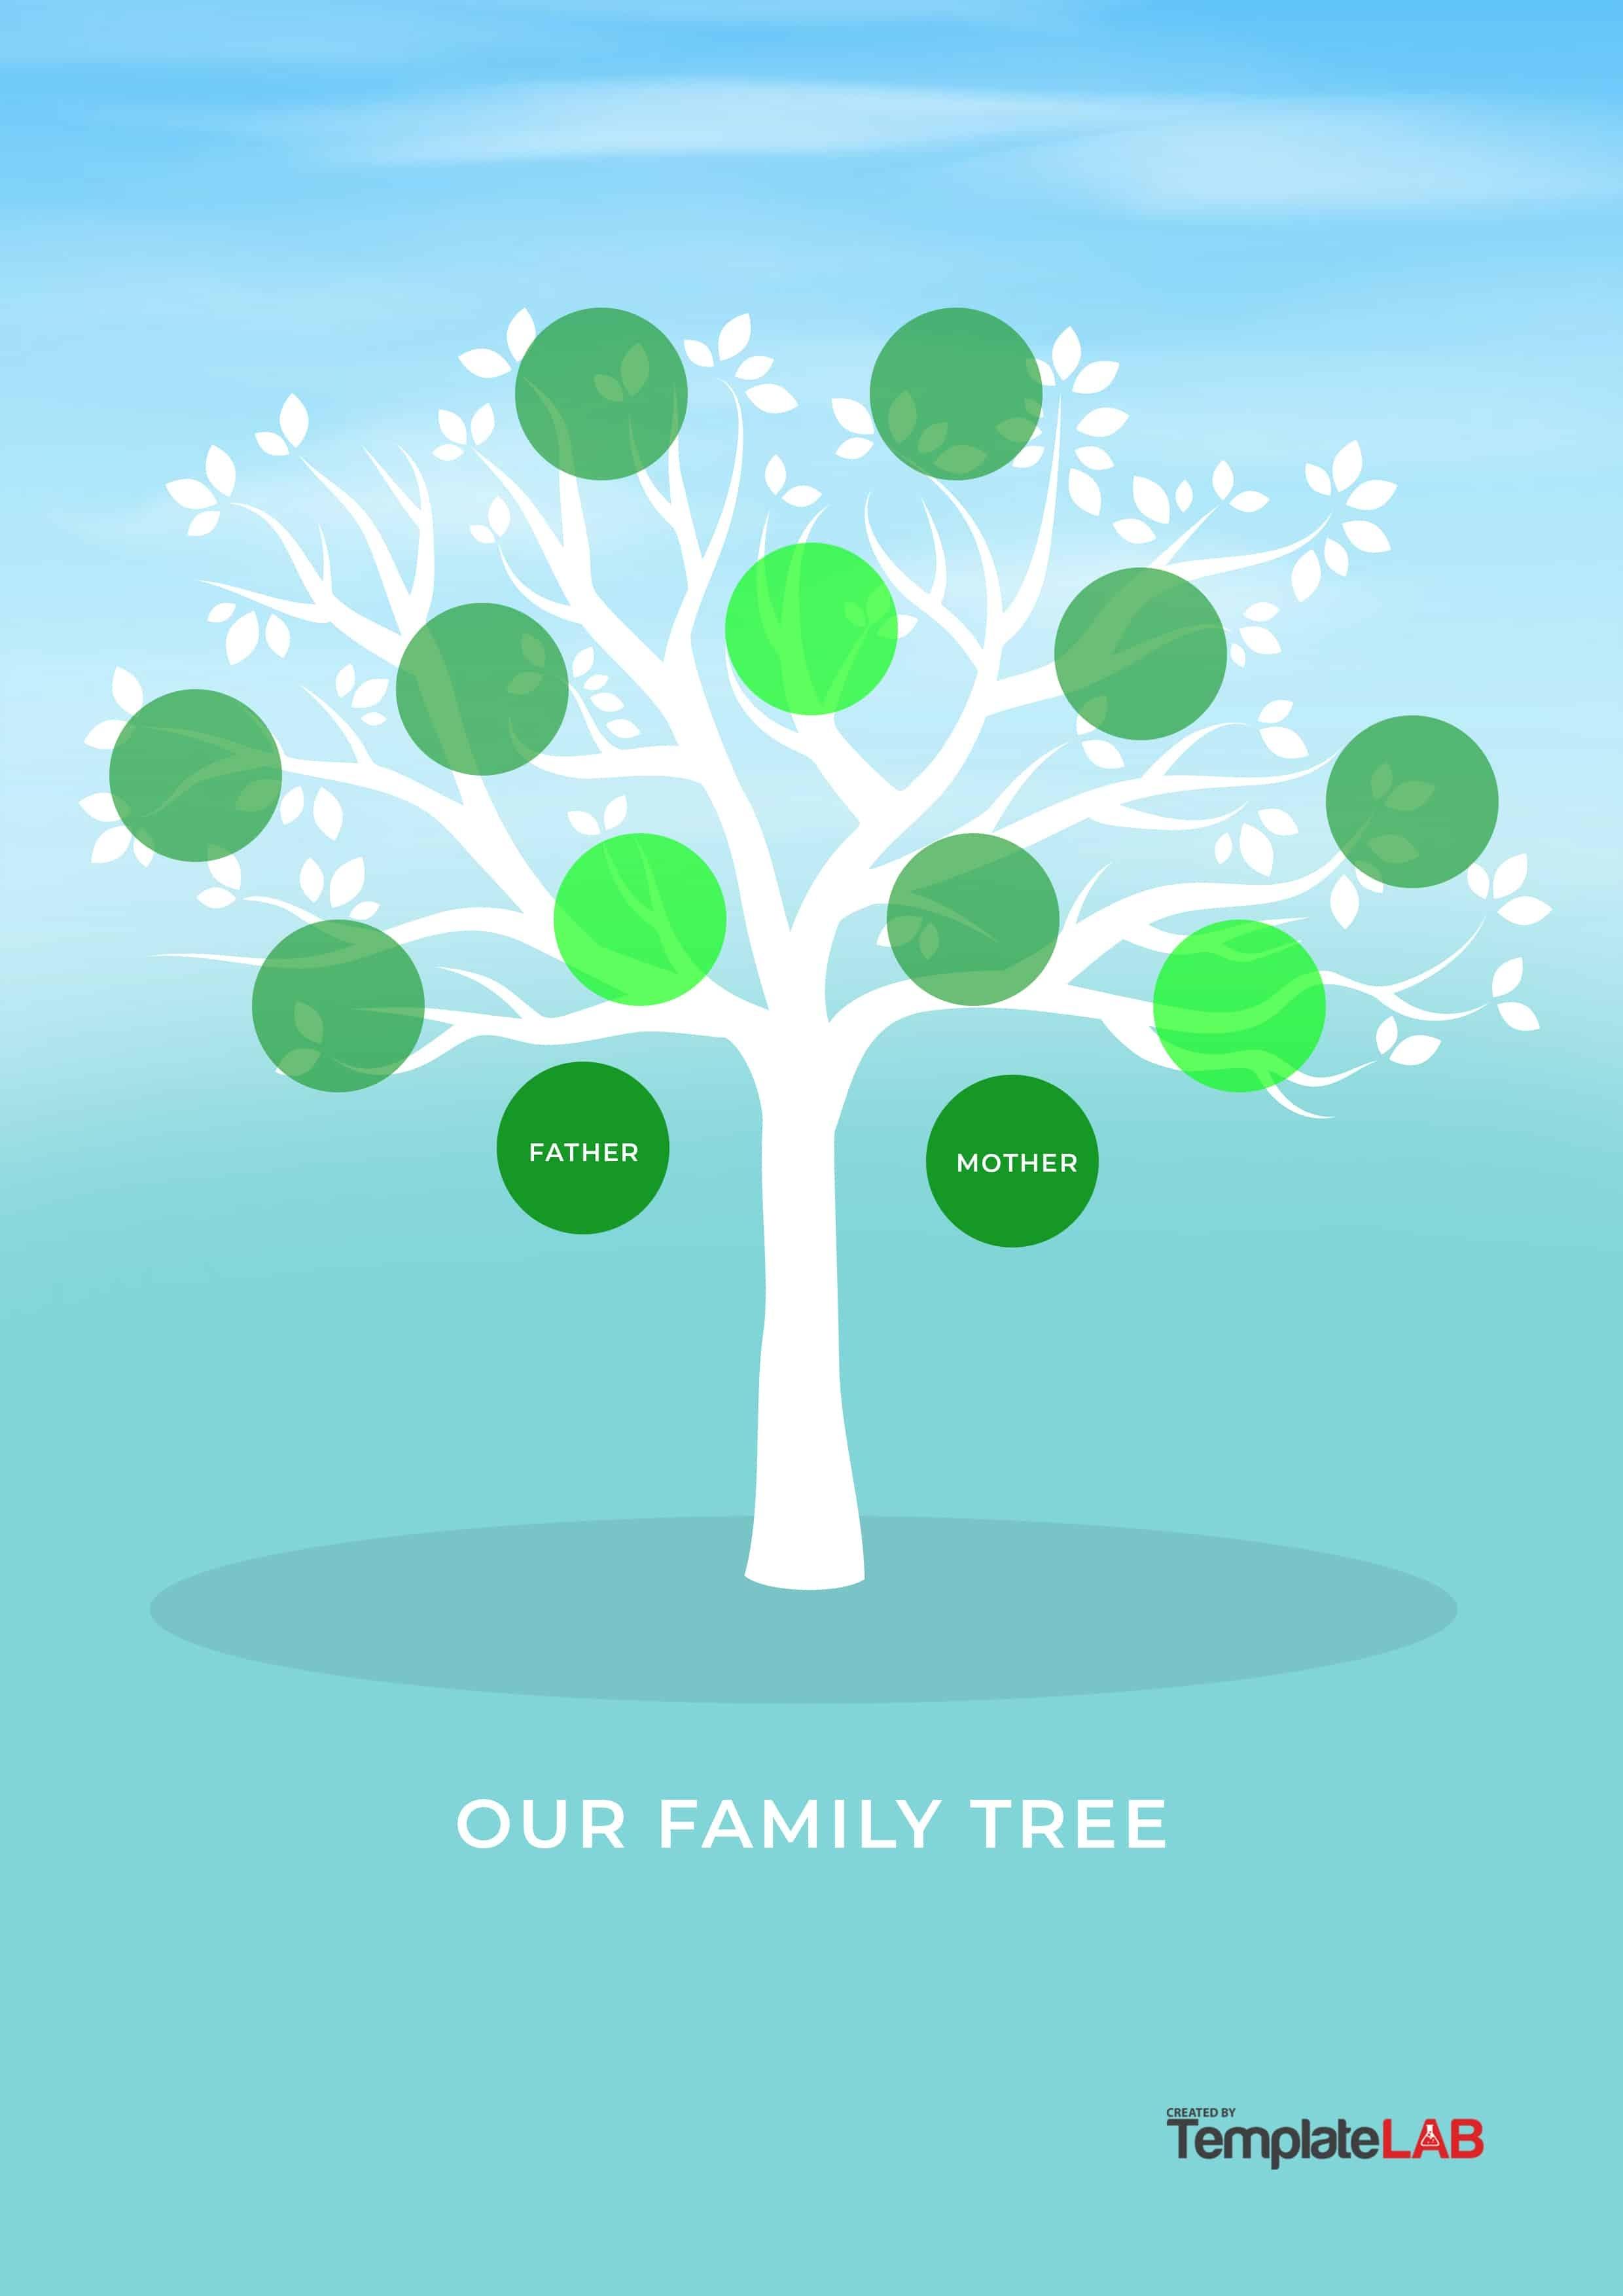 50+ Free Family Tree Templates (Word, Excel, Pdf) ᐅ Template Lab - Free Printable Family Tree